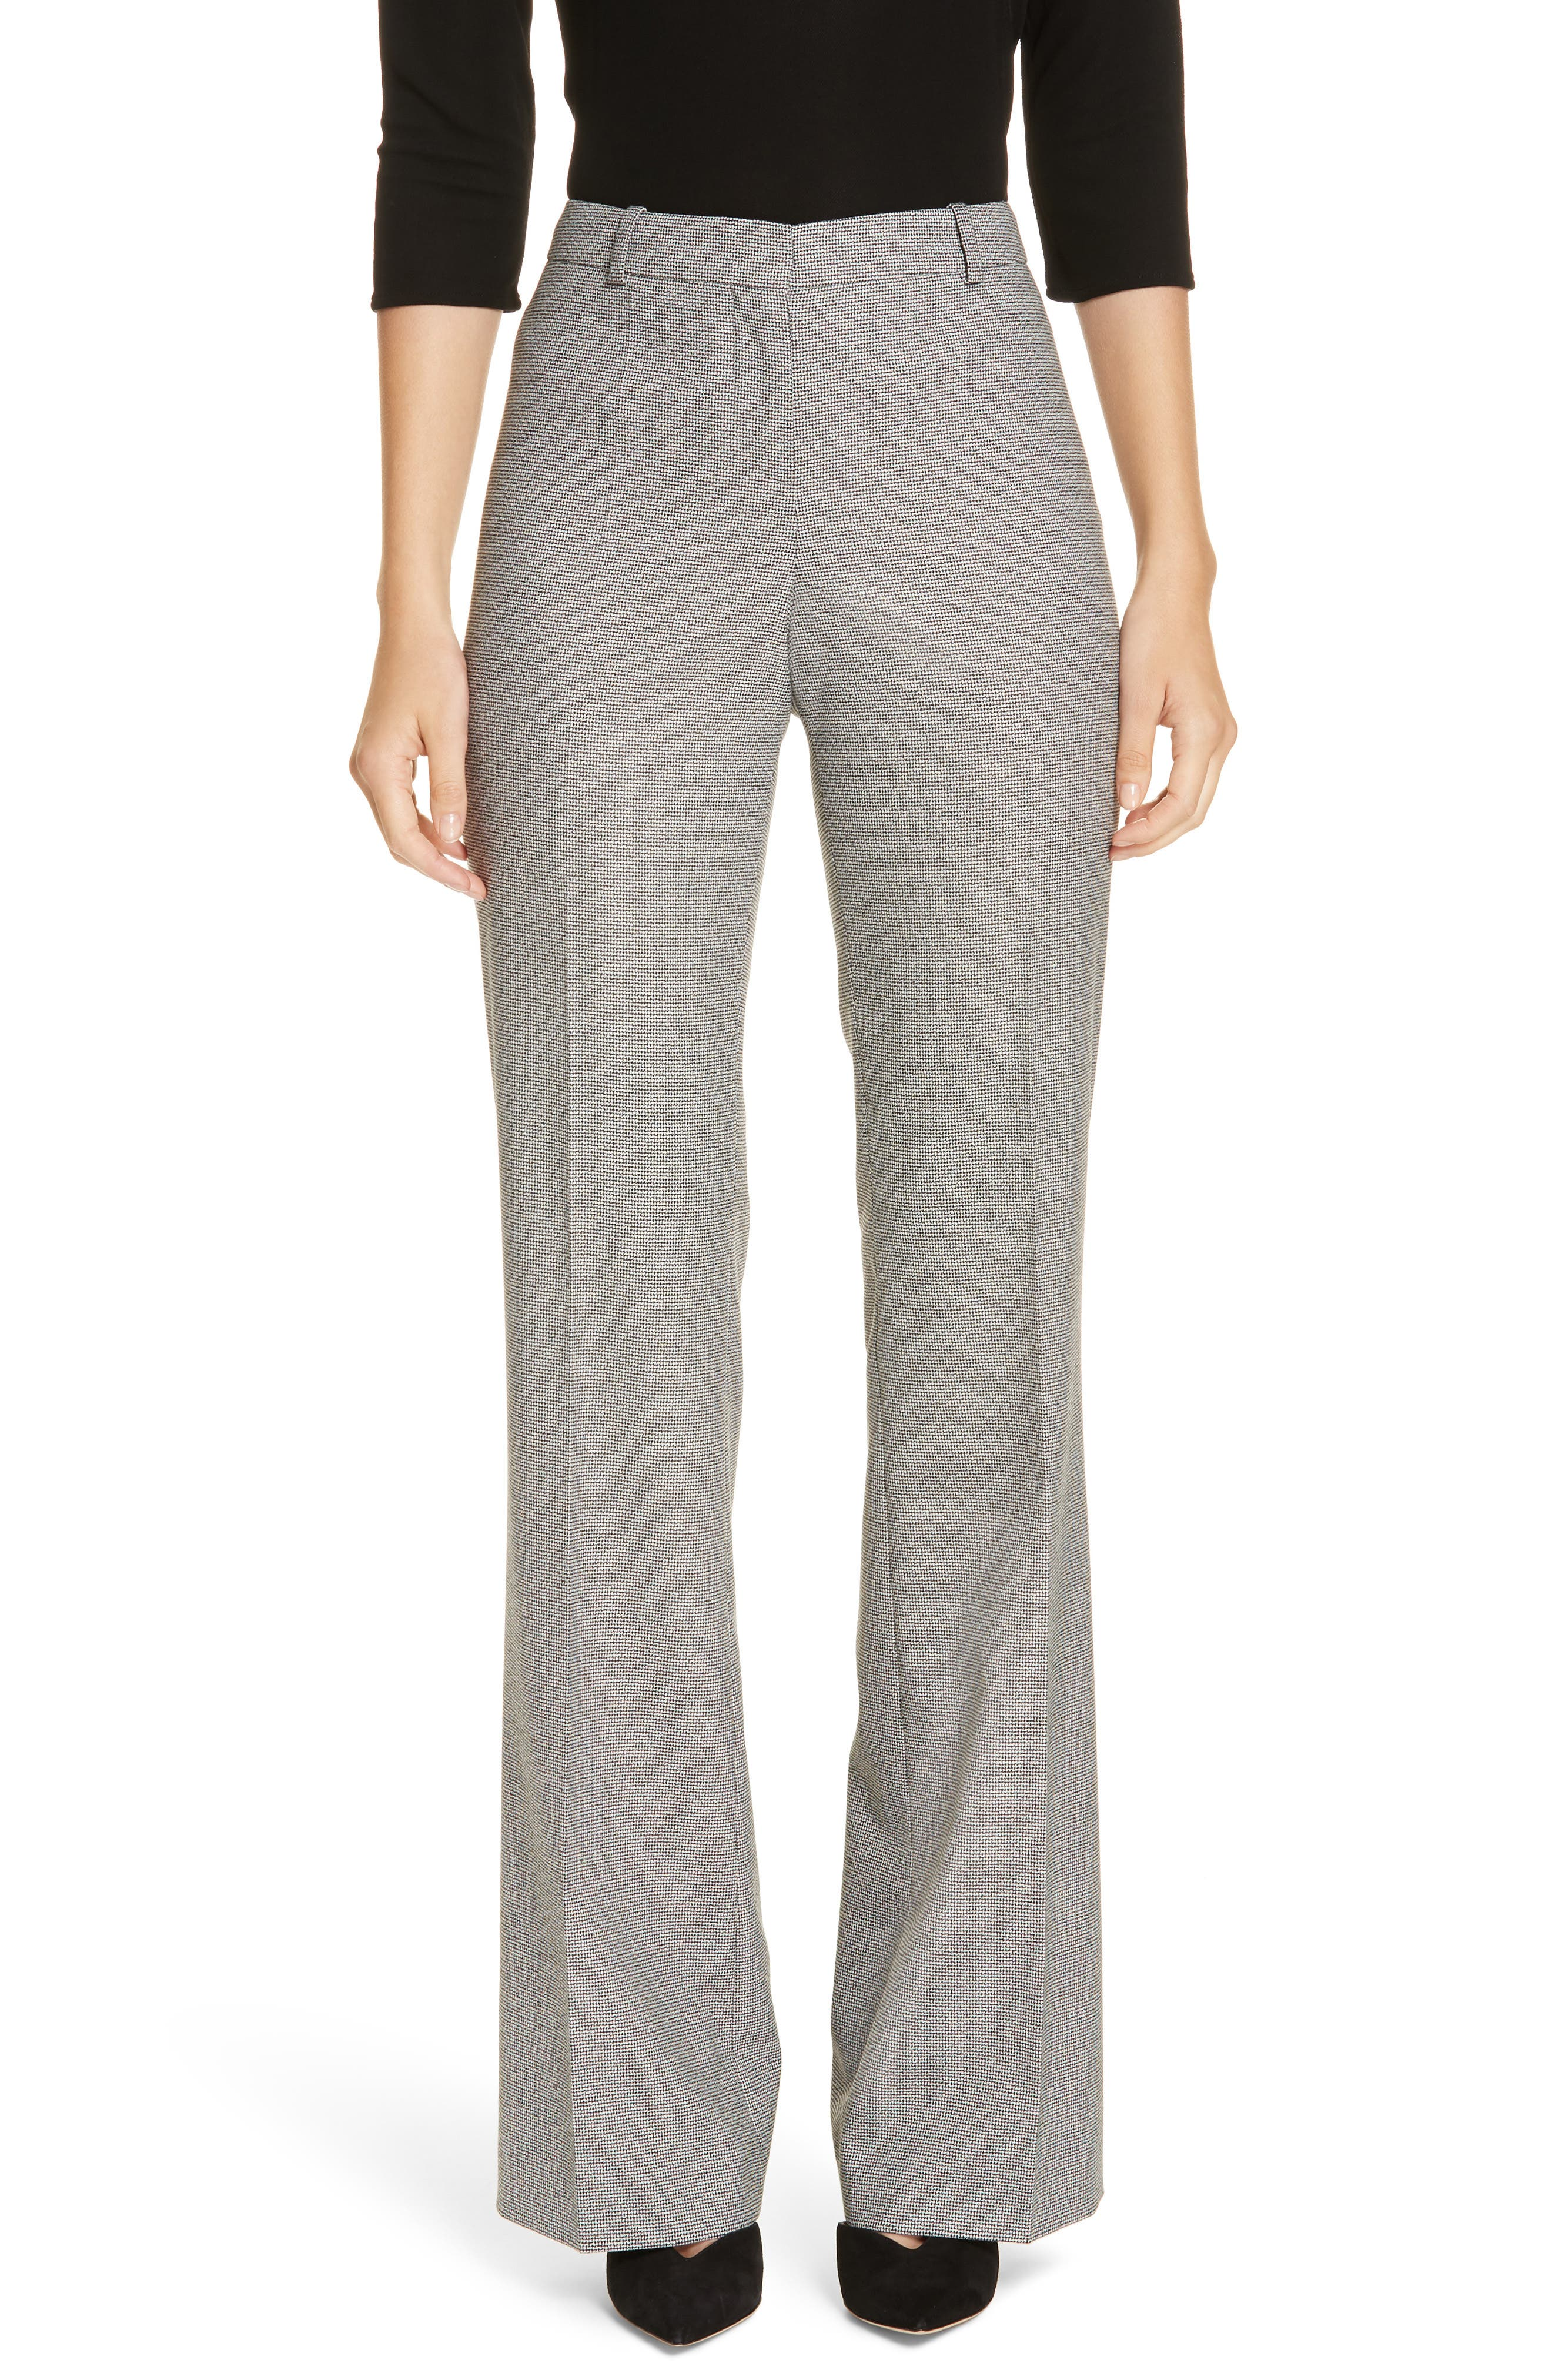 Tulea Blurred Optic Wool Suiting Trousers,                         Main,                         color, BLACK FANTASY